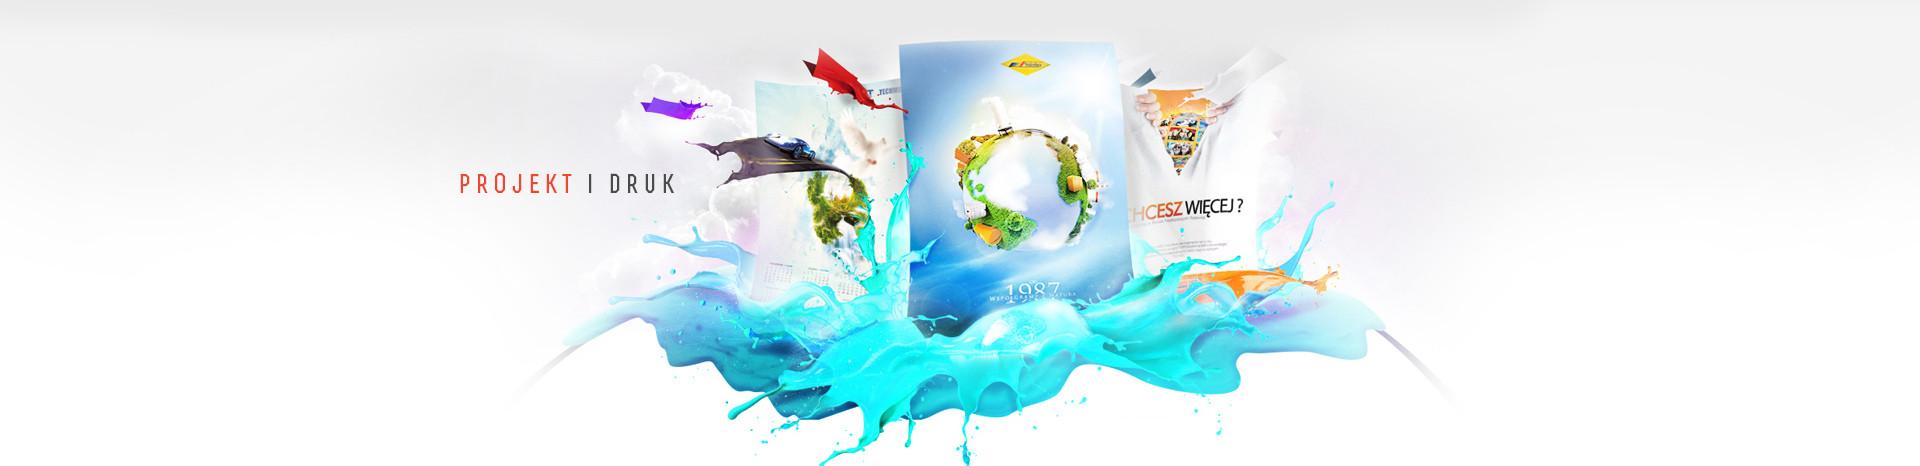 Projekt folderó, katalog produktowy, projekt katalogu